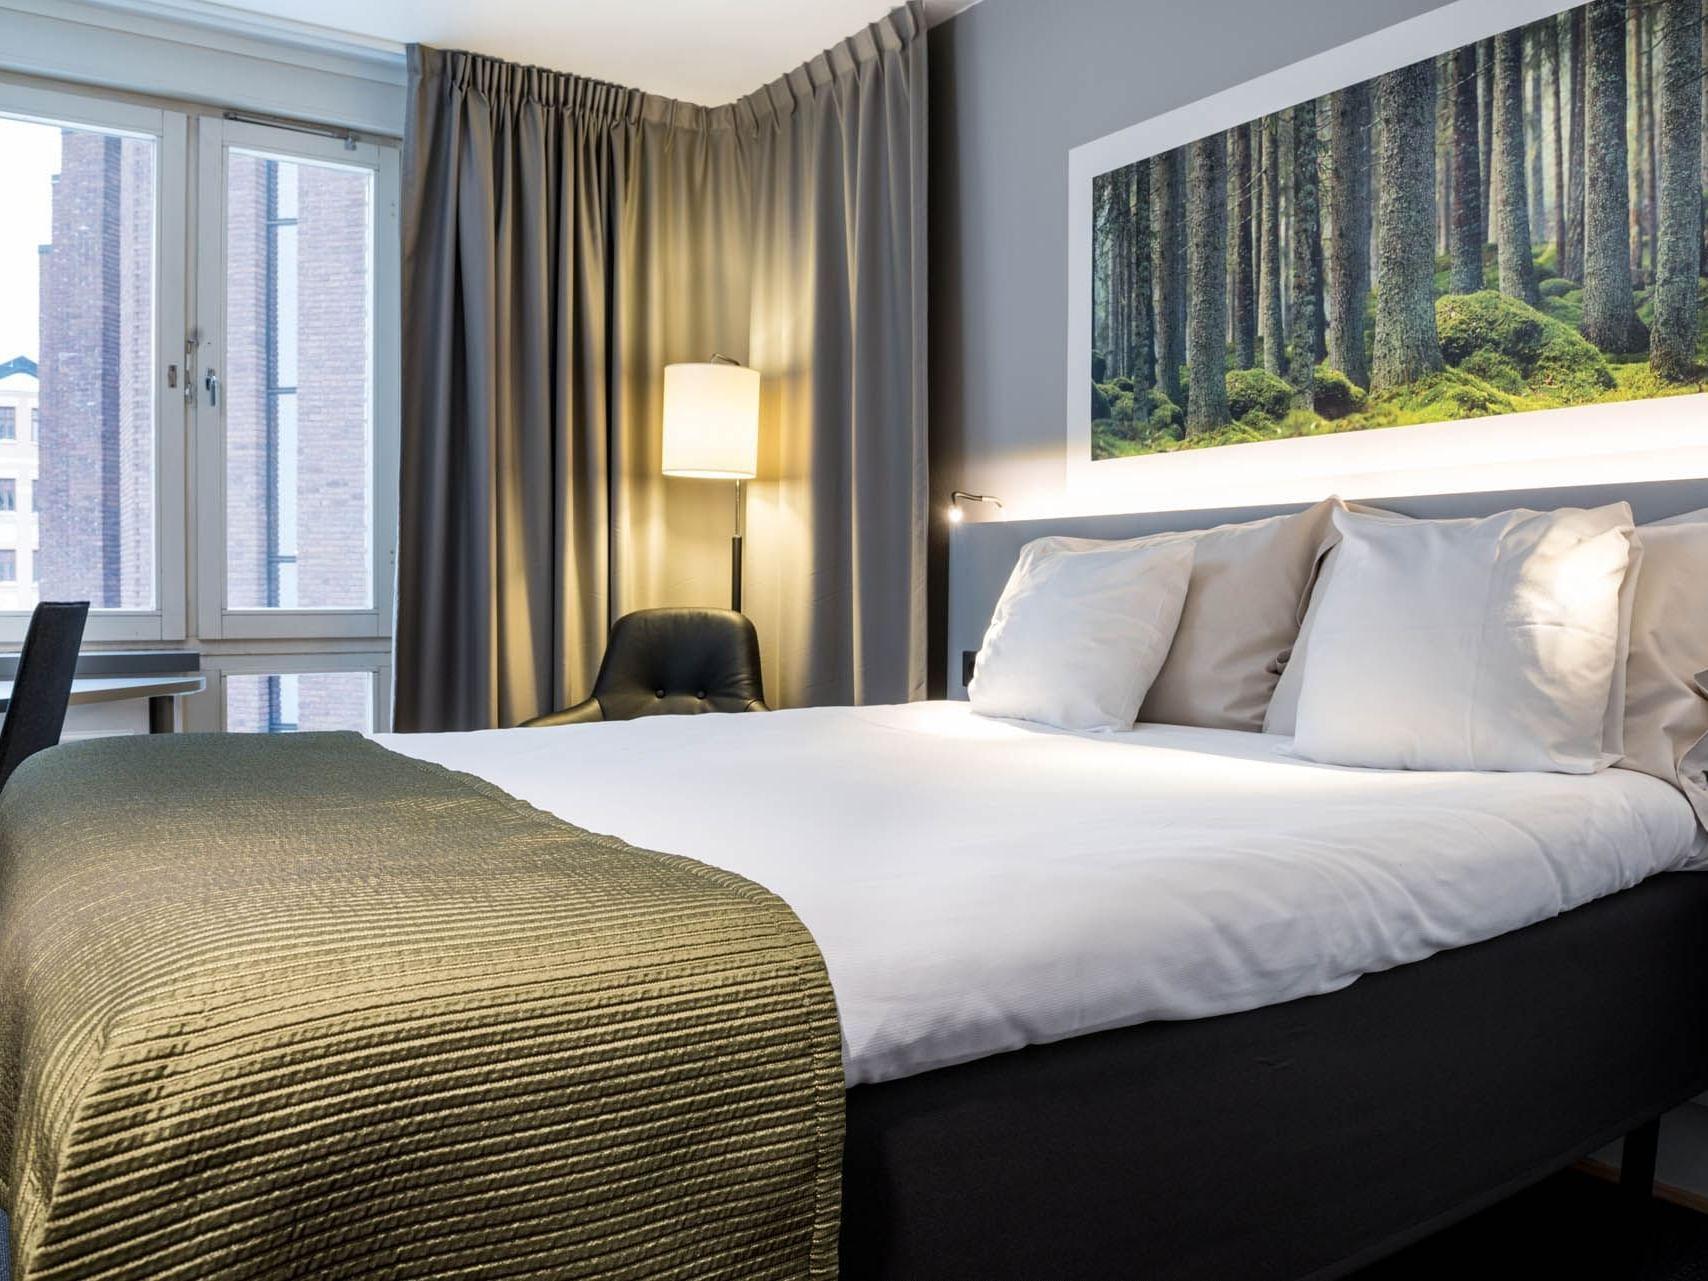 Double Small Room at Hotel Birger Jarl in Stockholm, Sweden